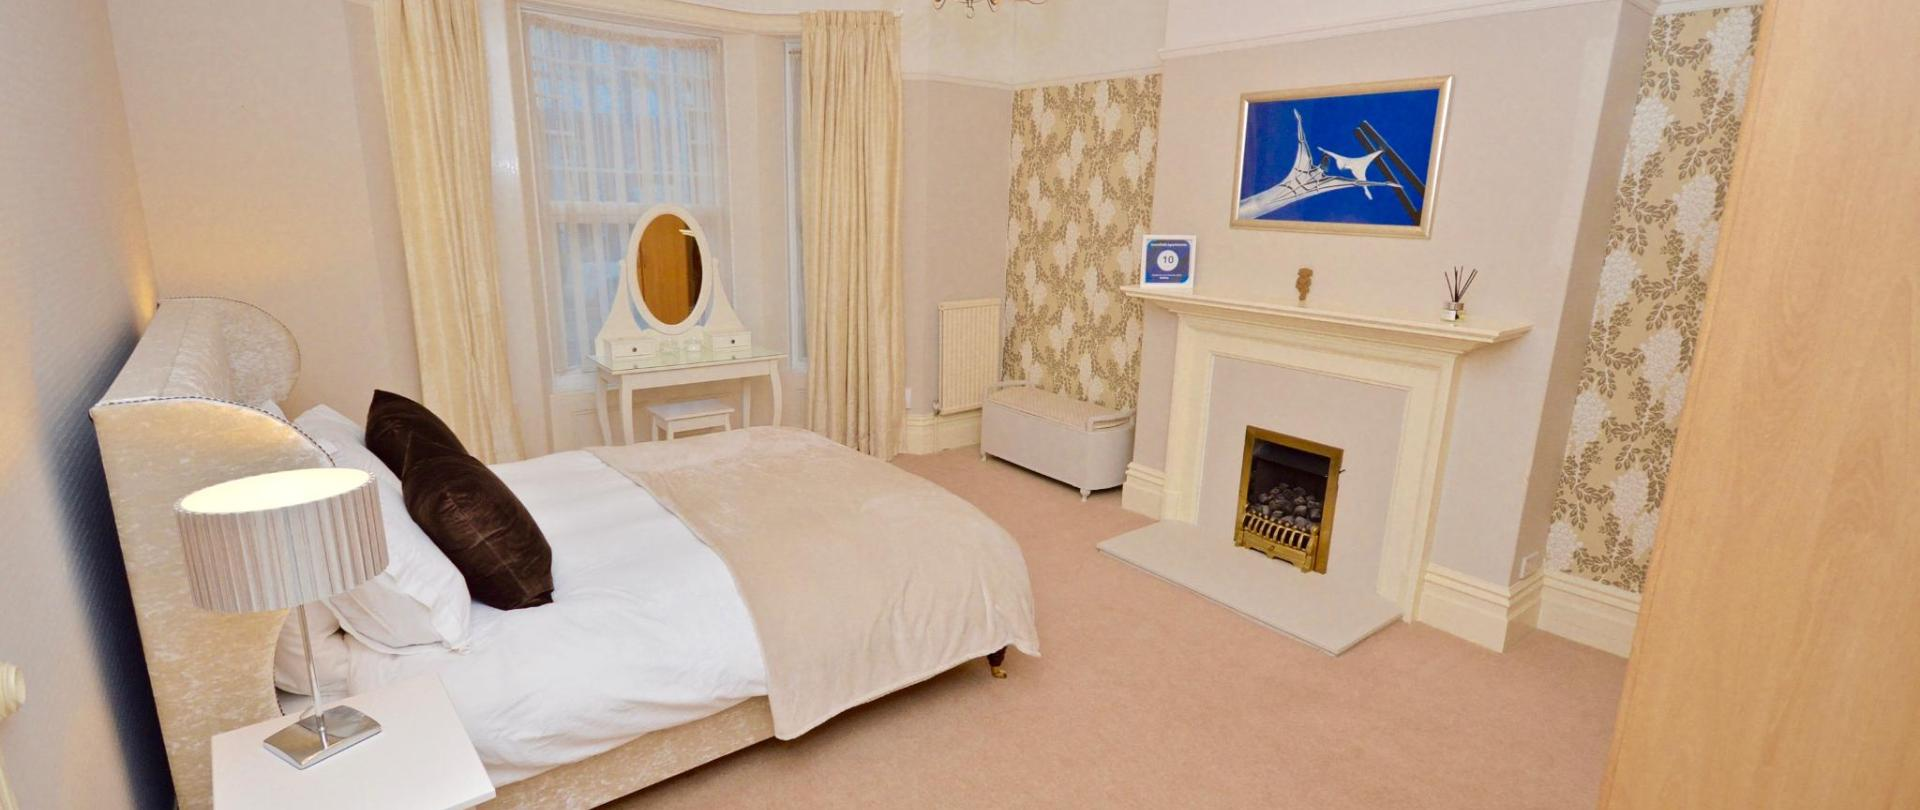 Duplex bedroom pic 2 high res.jpg